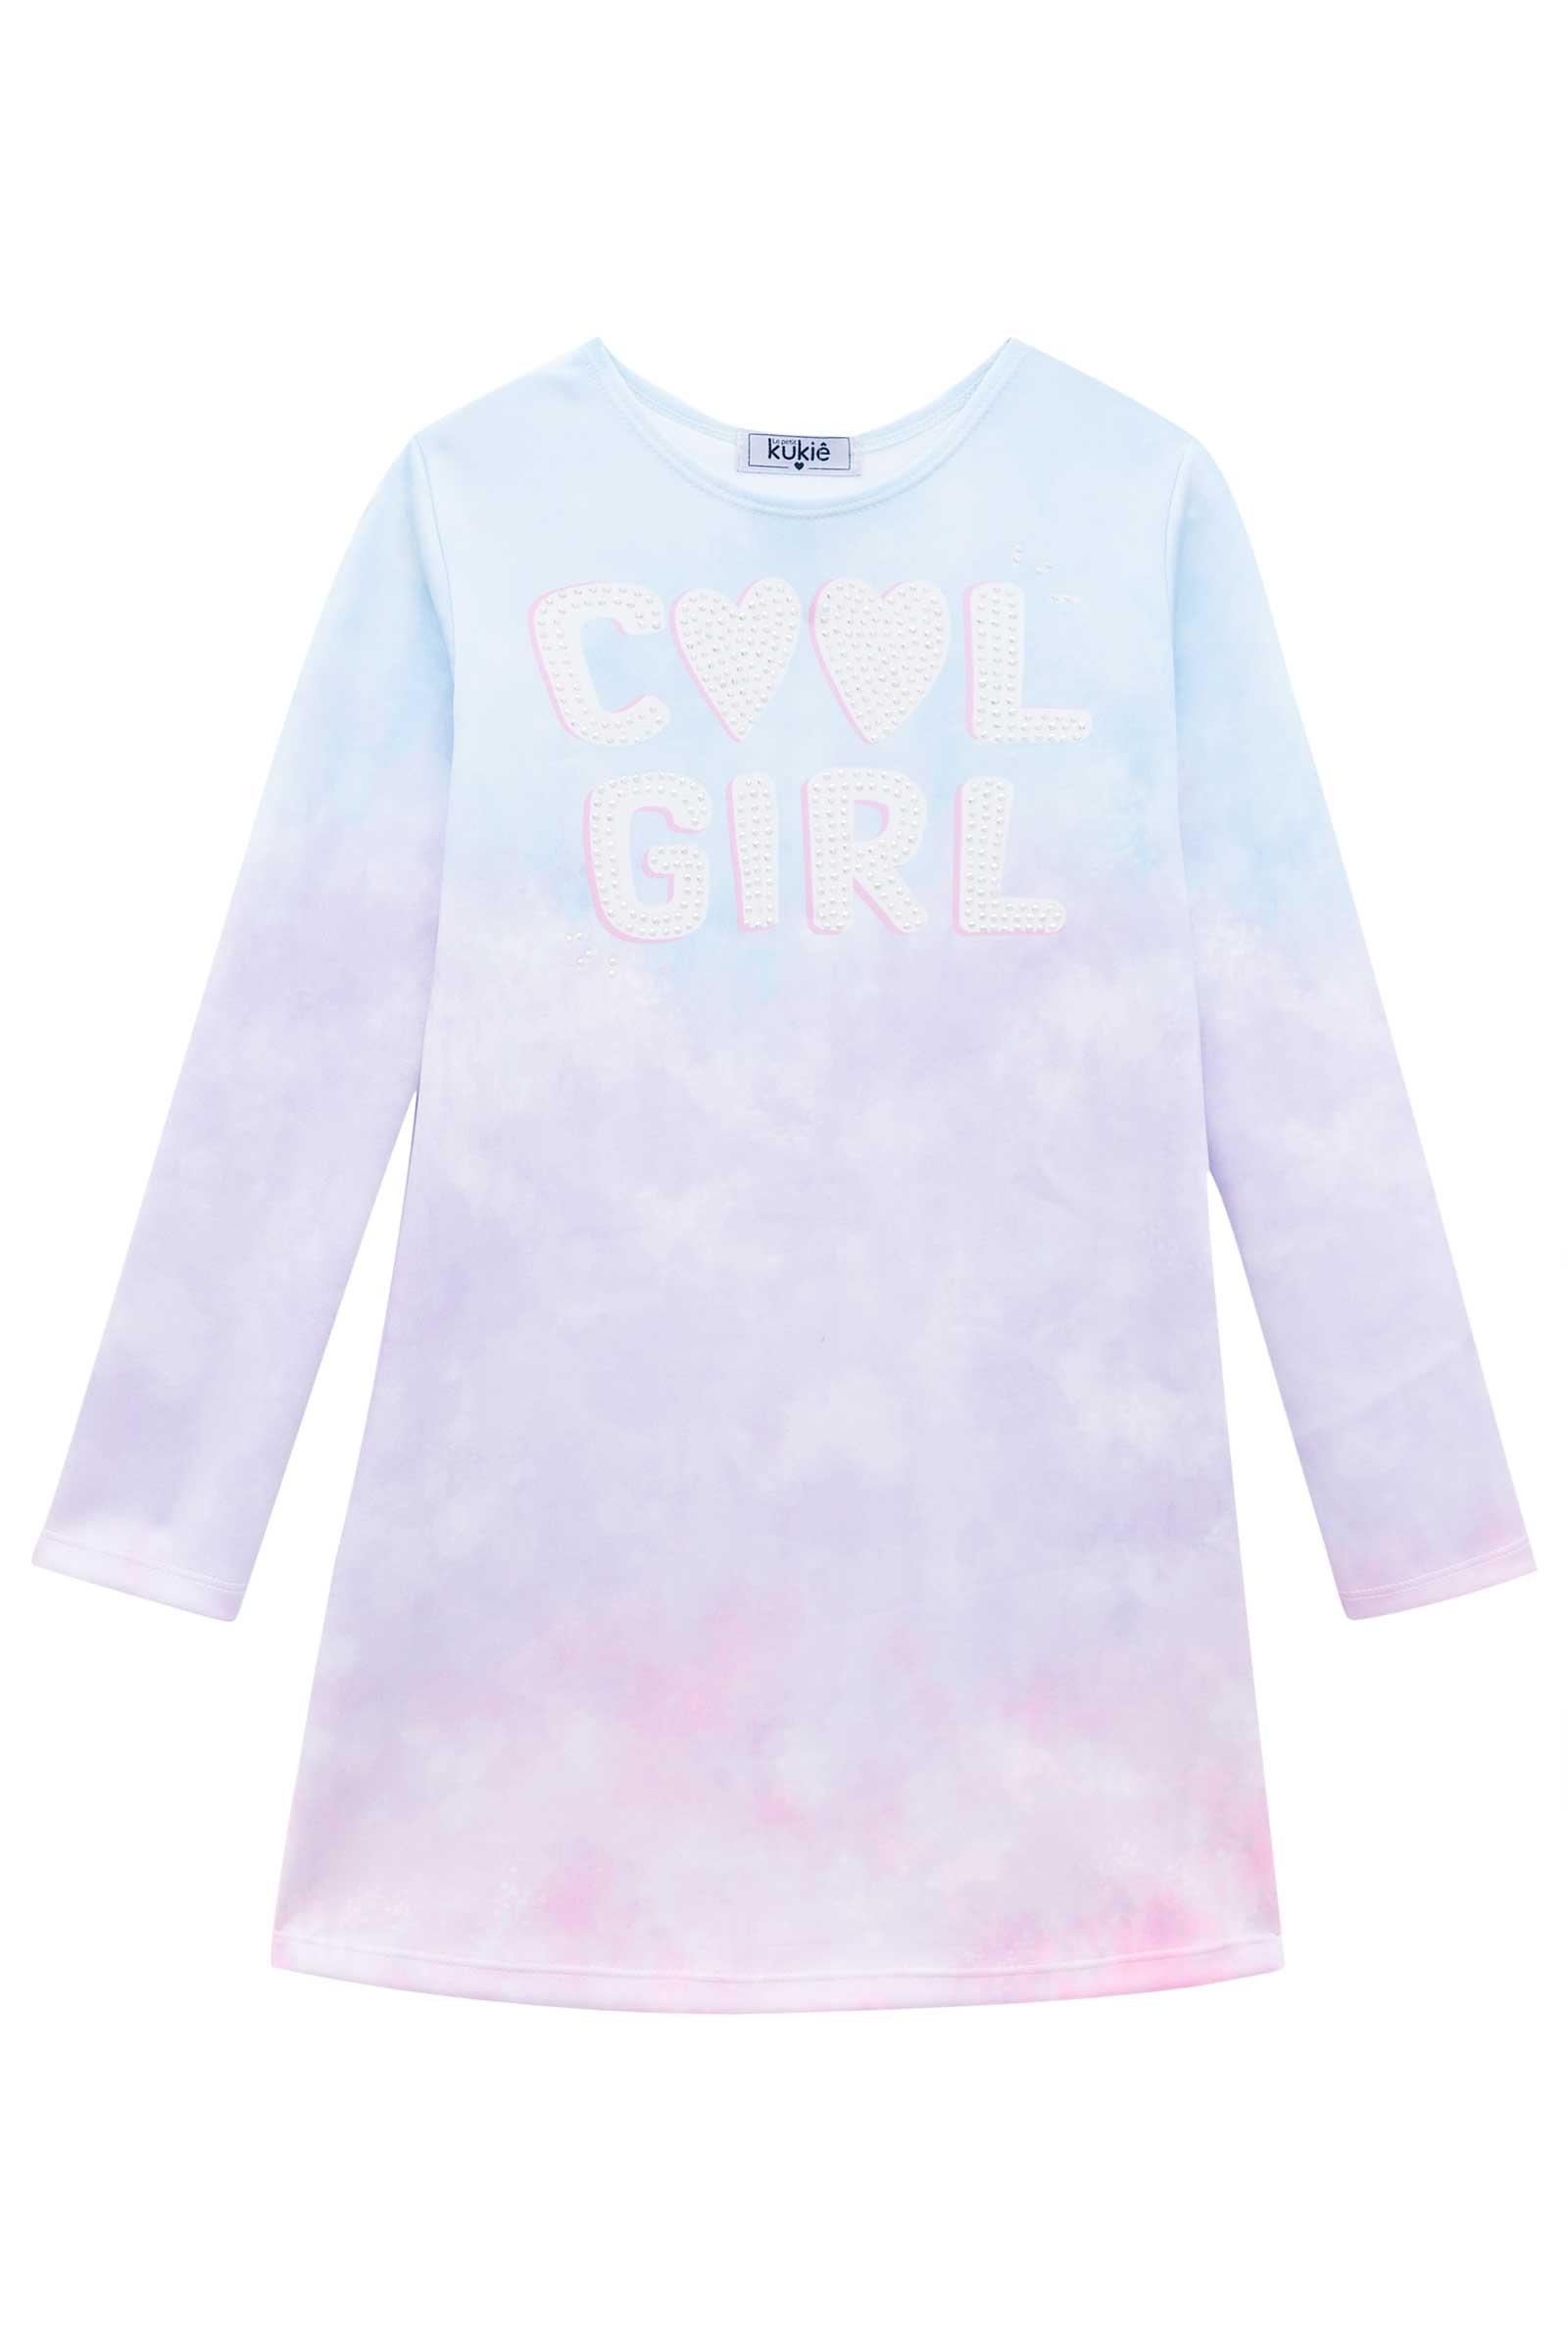 Vestido Kukie Inverno Tie Dye Cool Girl